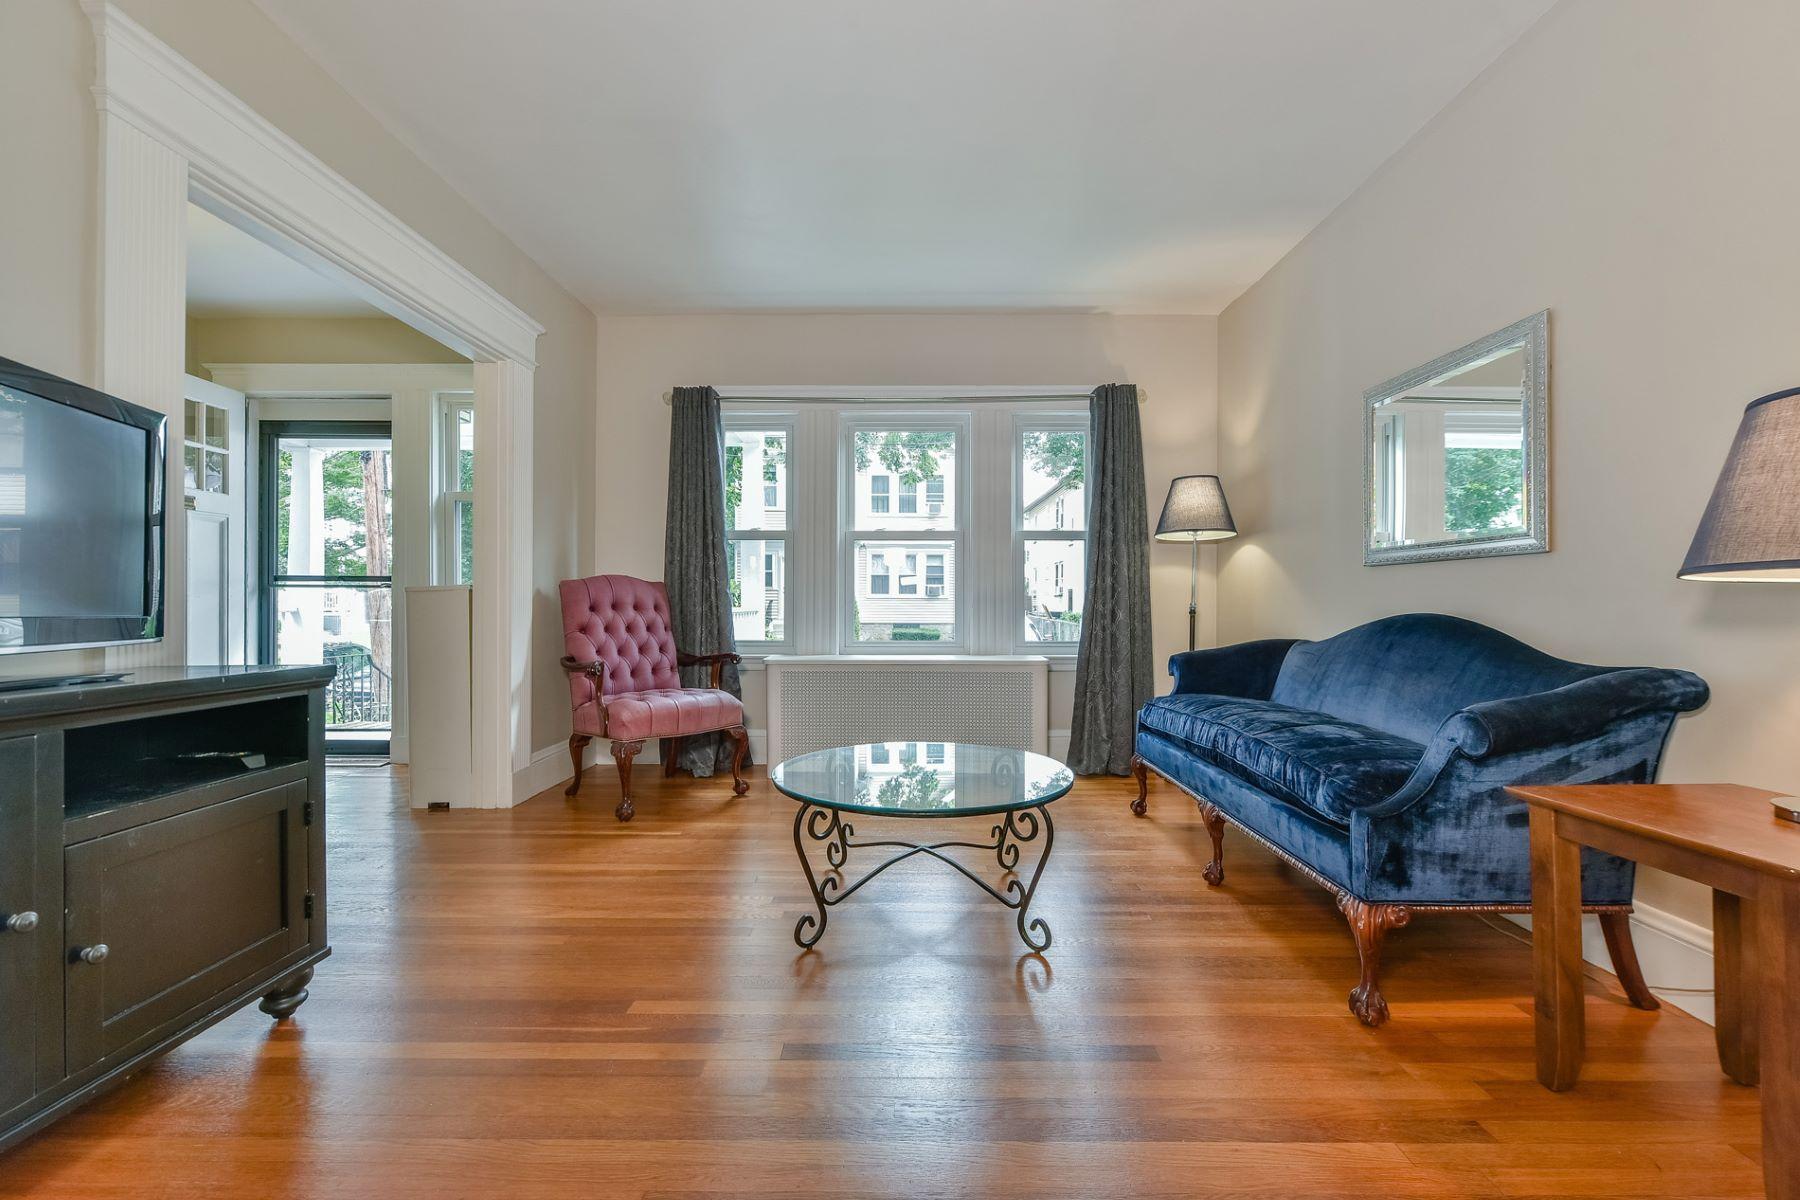 Additional photo for property listing at 10 Dent Street 1, Boston 10 Dent St 1 Boston, Massachusetts 02132 United States